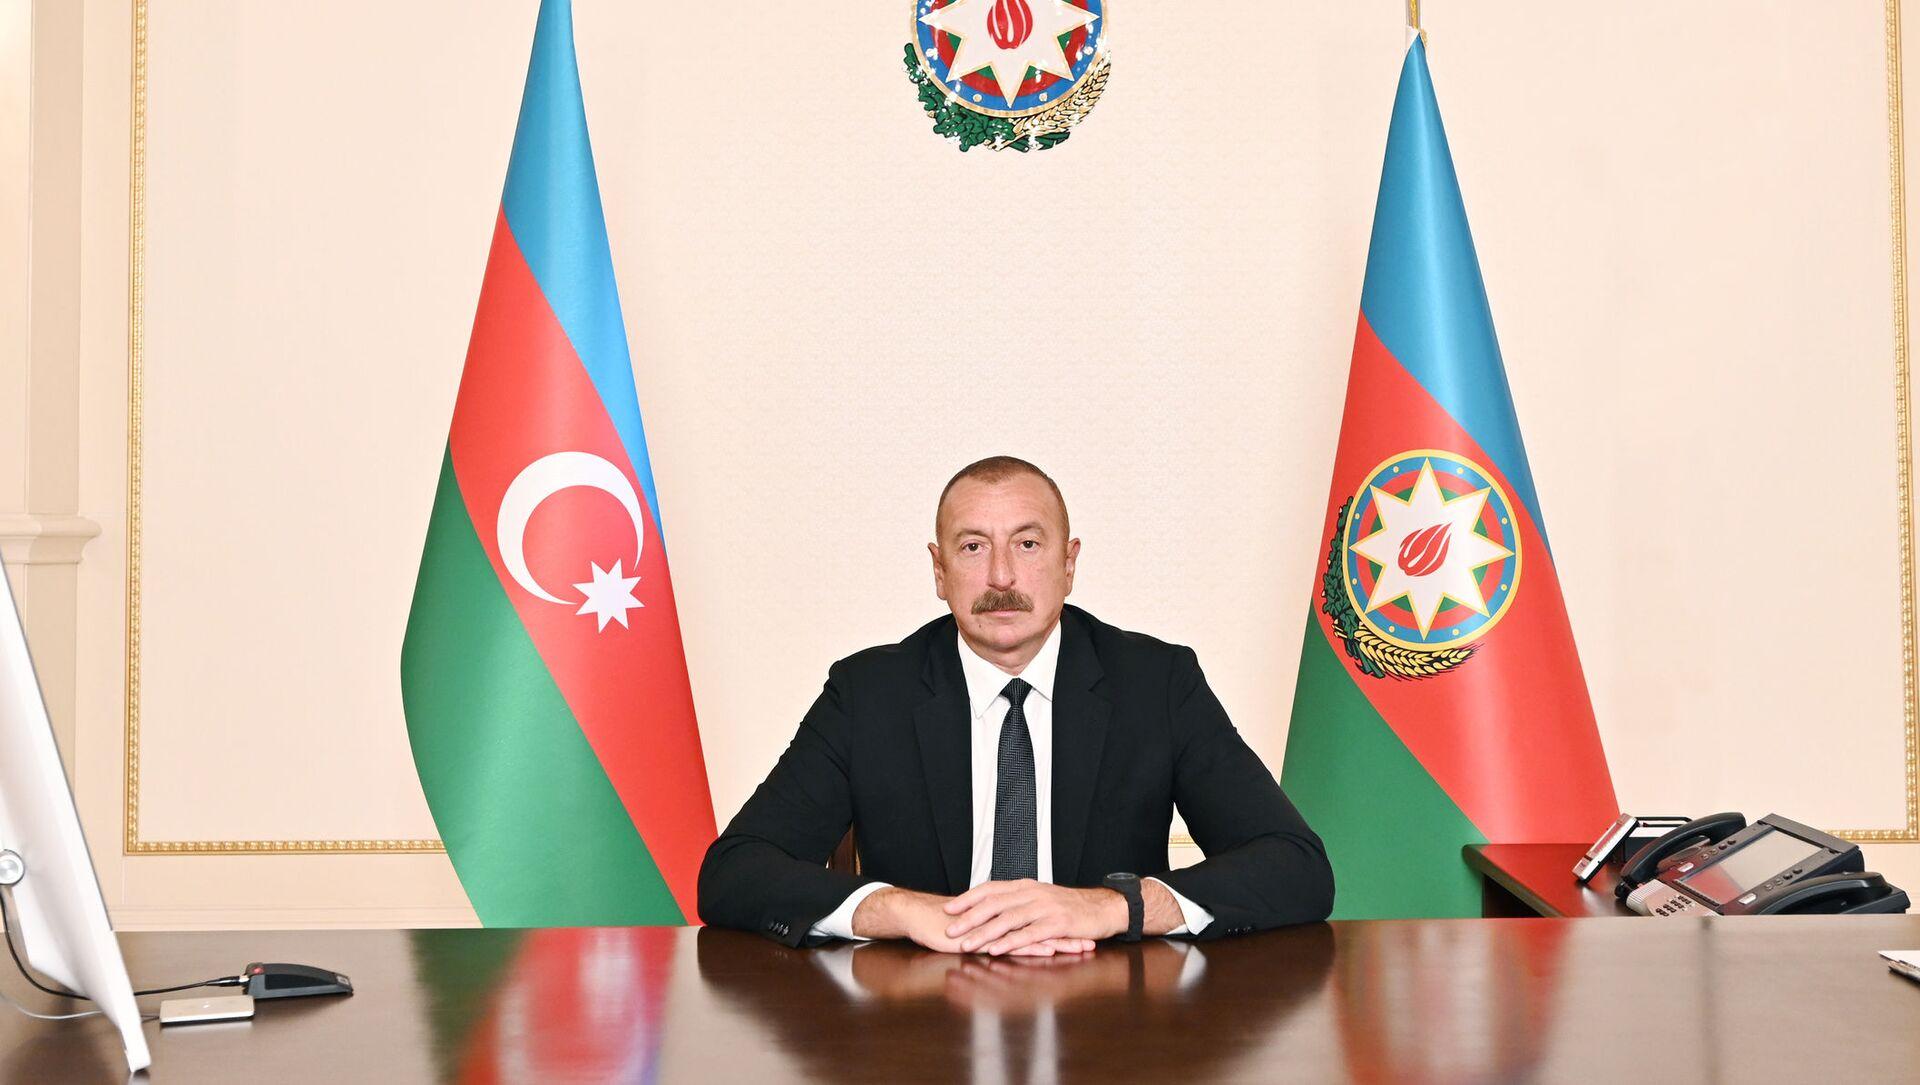 Выступление Президента Ильхама Алиева в видеоформате на II саммите ОИС по науке и технологиям - Sputnik Азербайджан, 1920, 16.06.2021